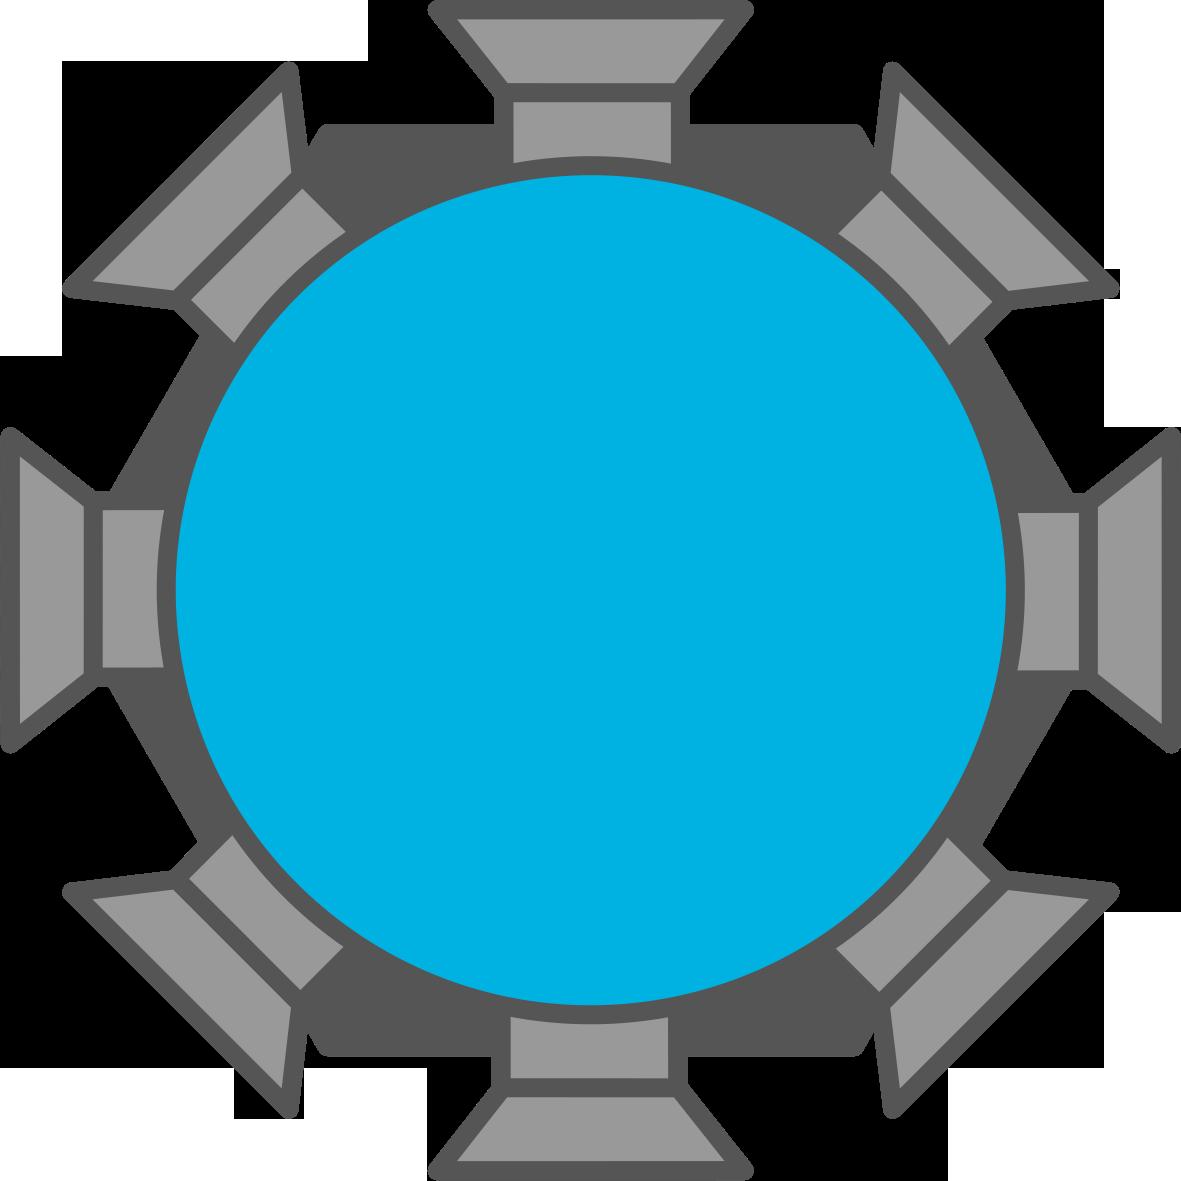 OrbitIsCool